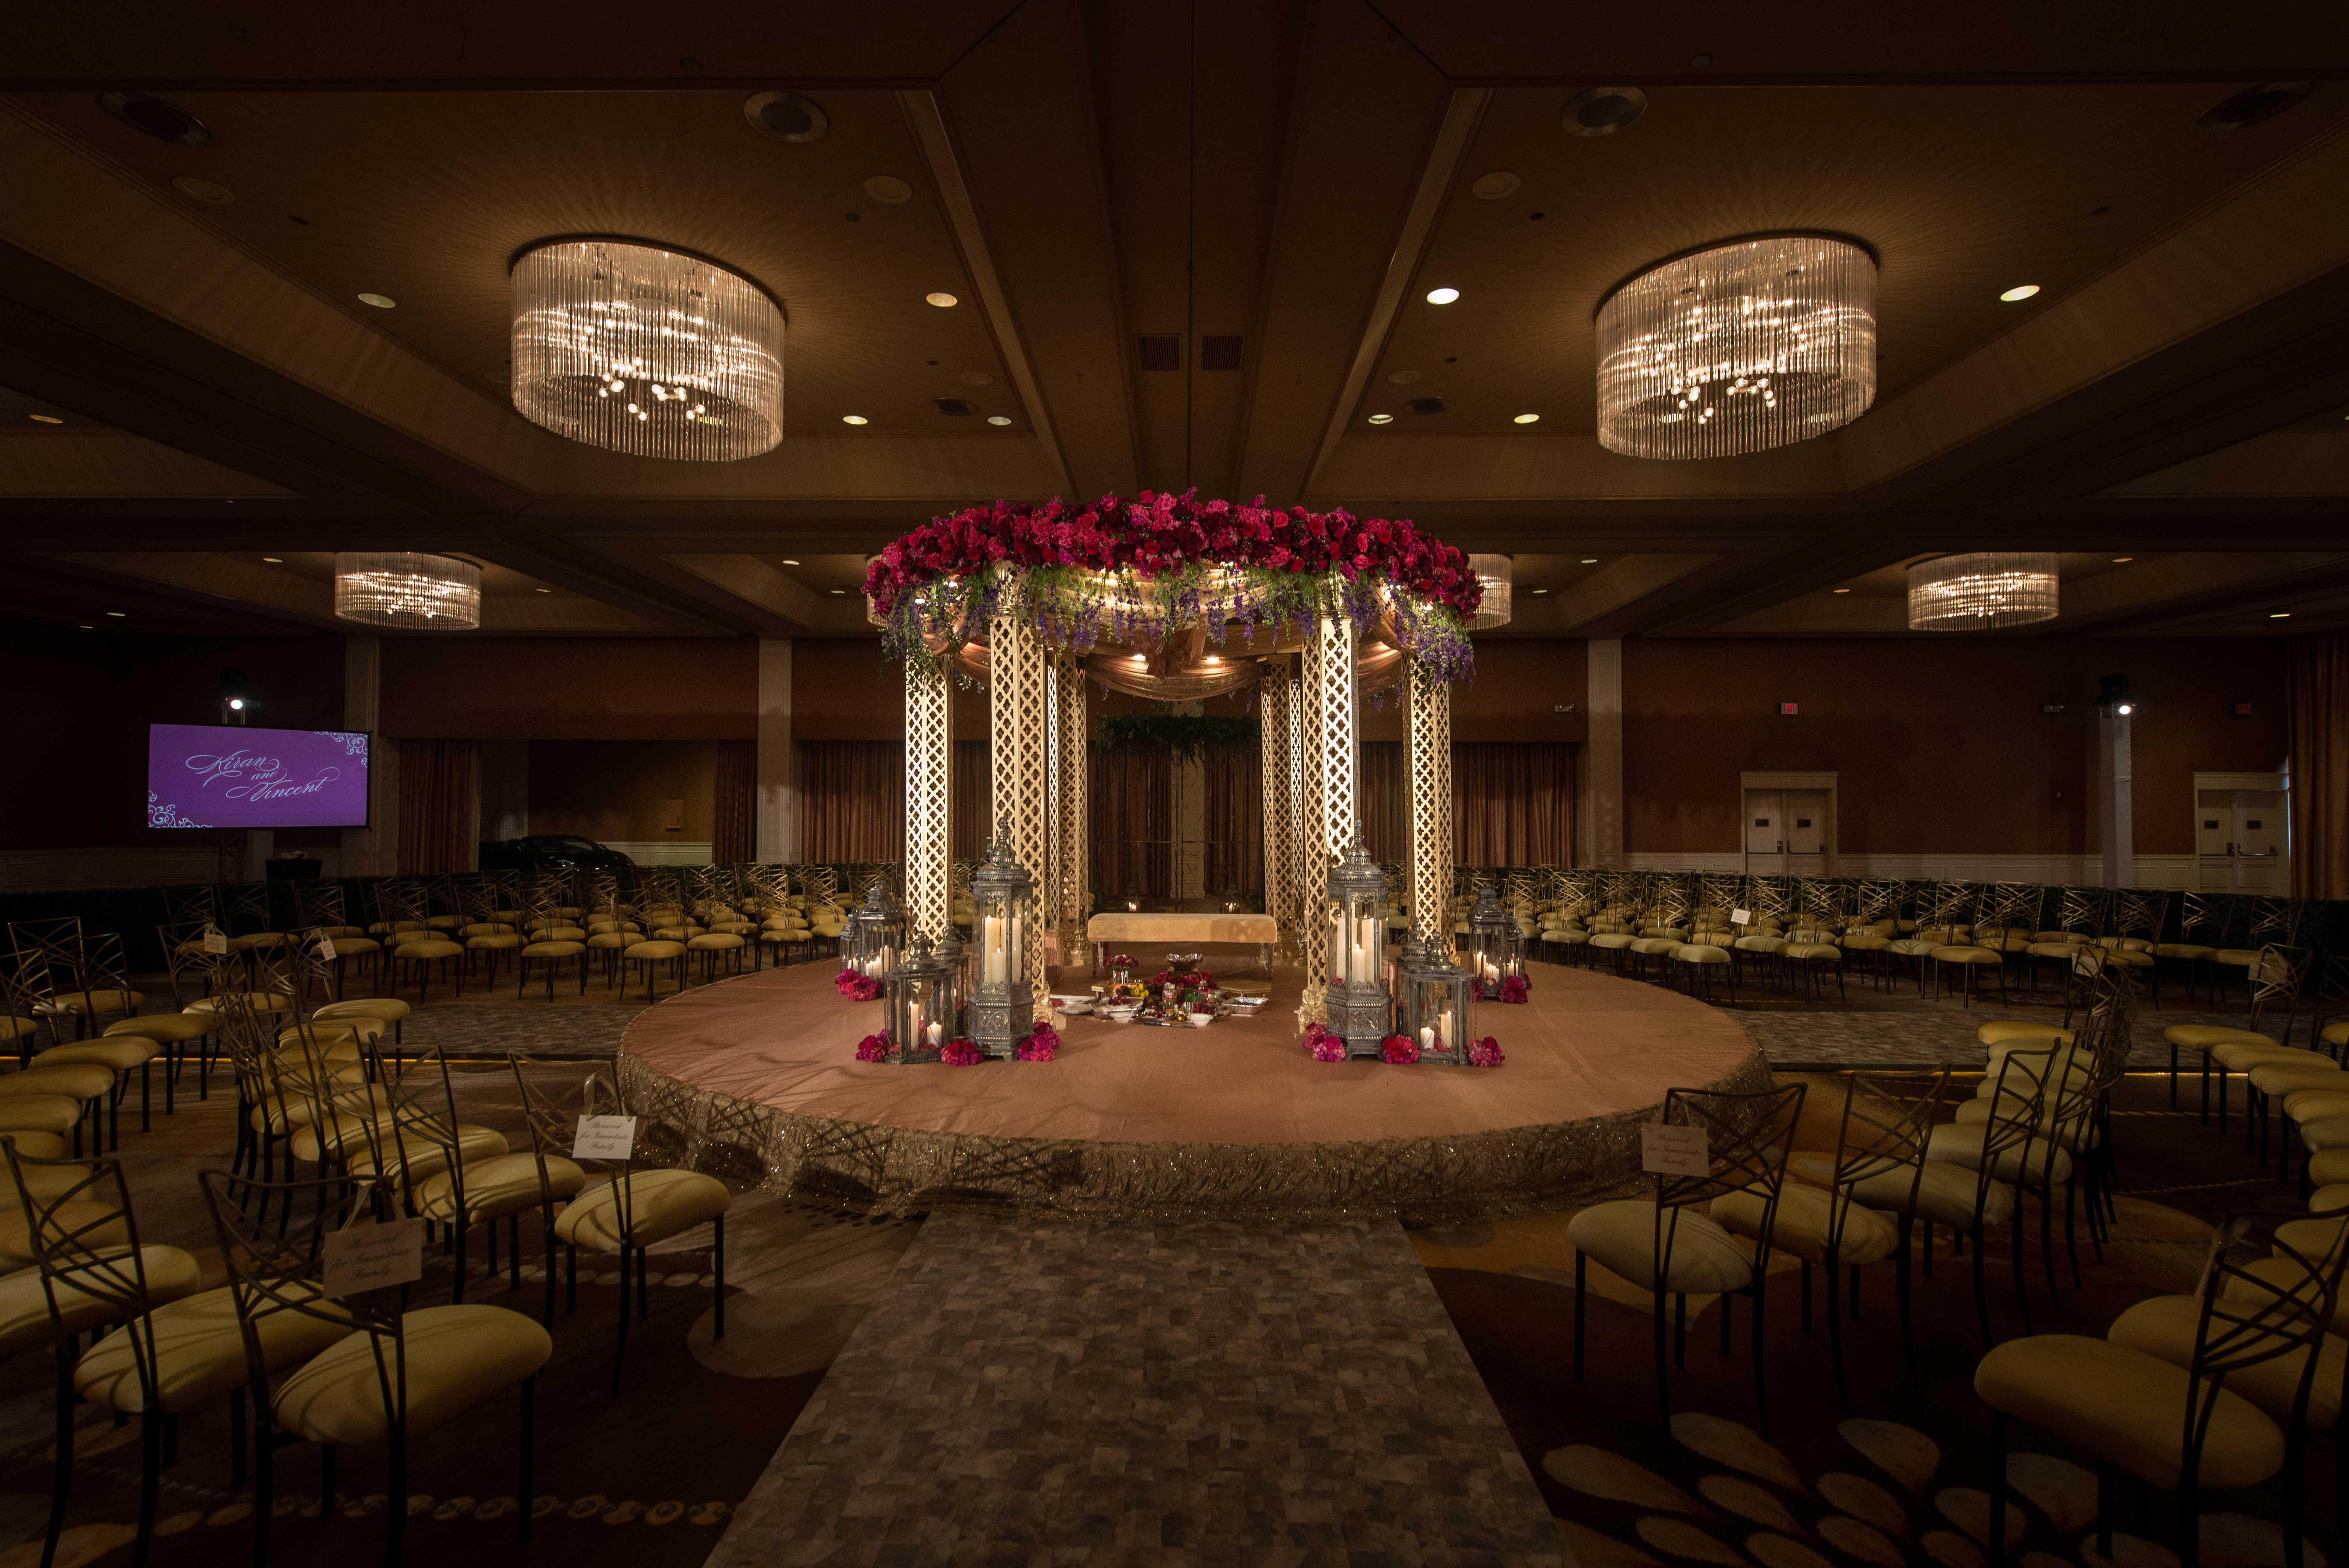 Dark and moody interfaith Indian Catholic wedding ceremony in ballroom